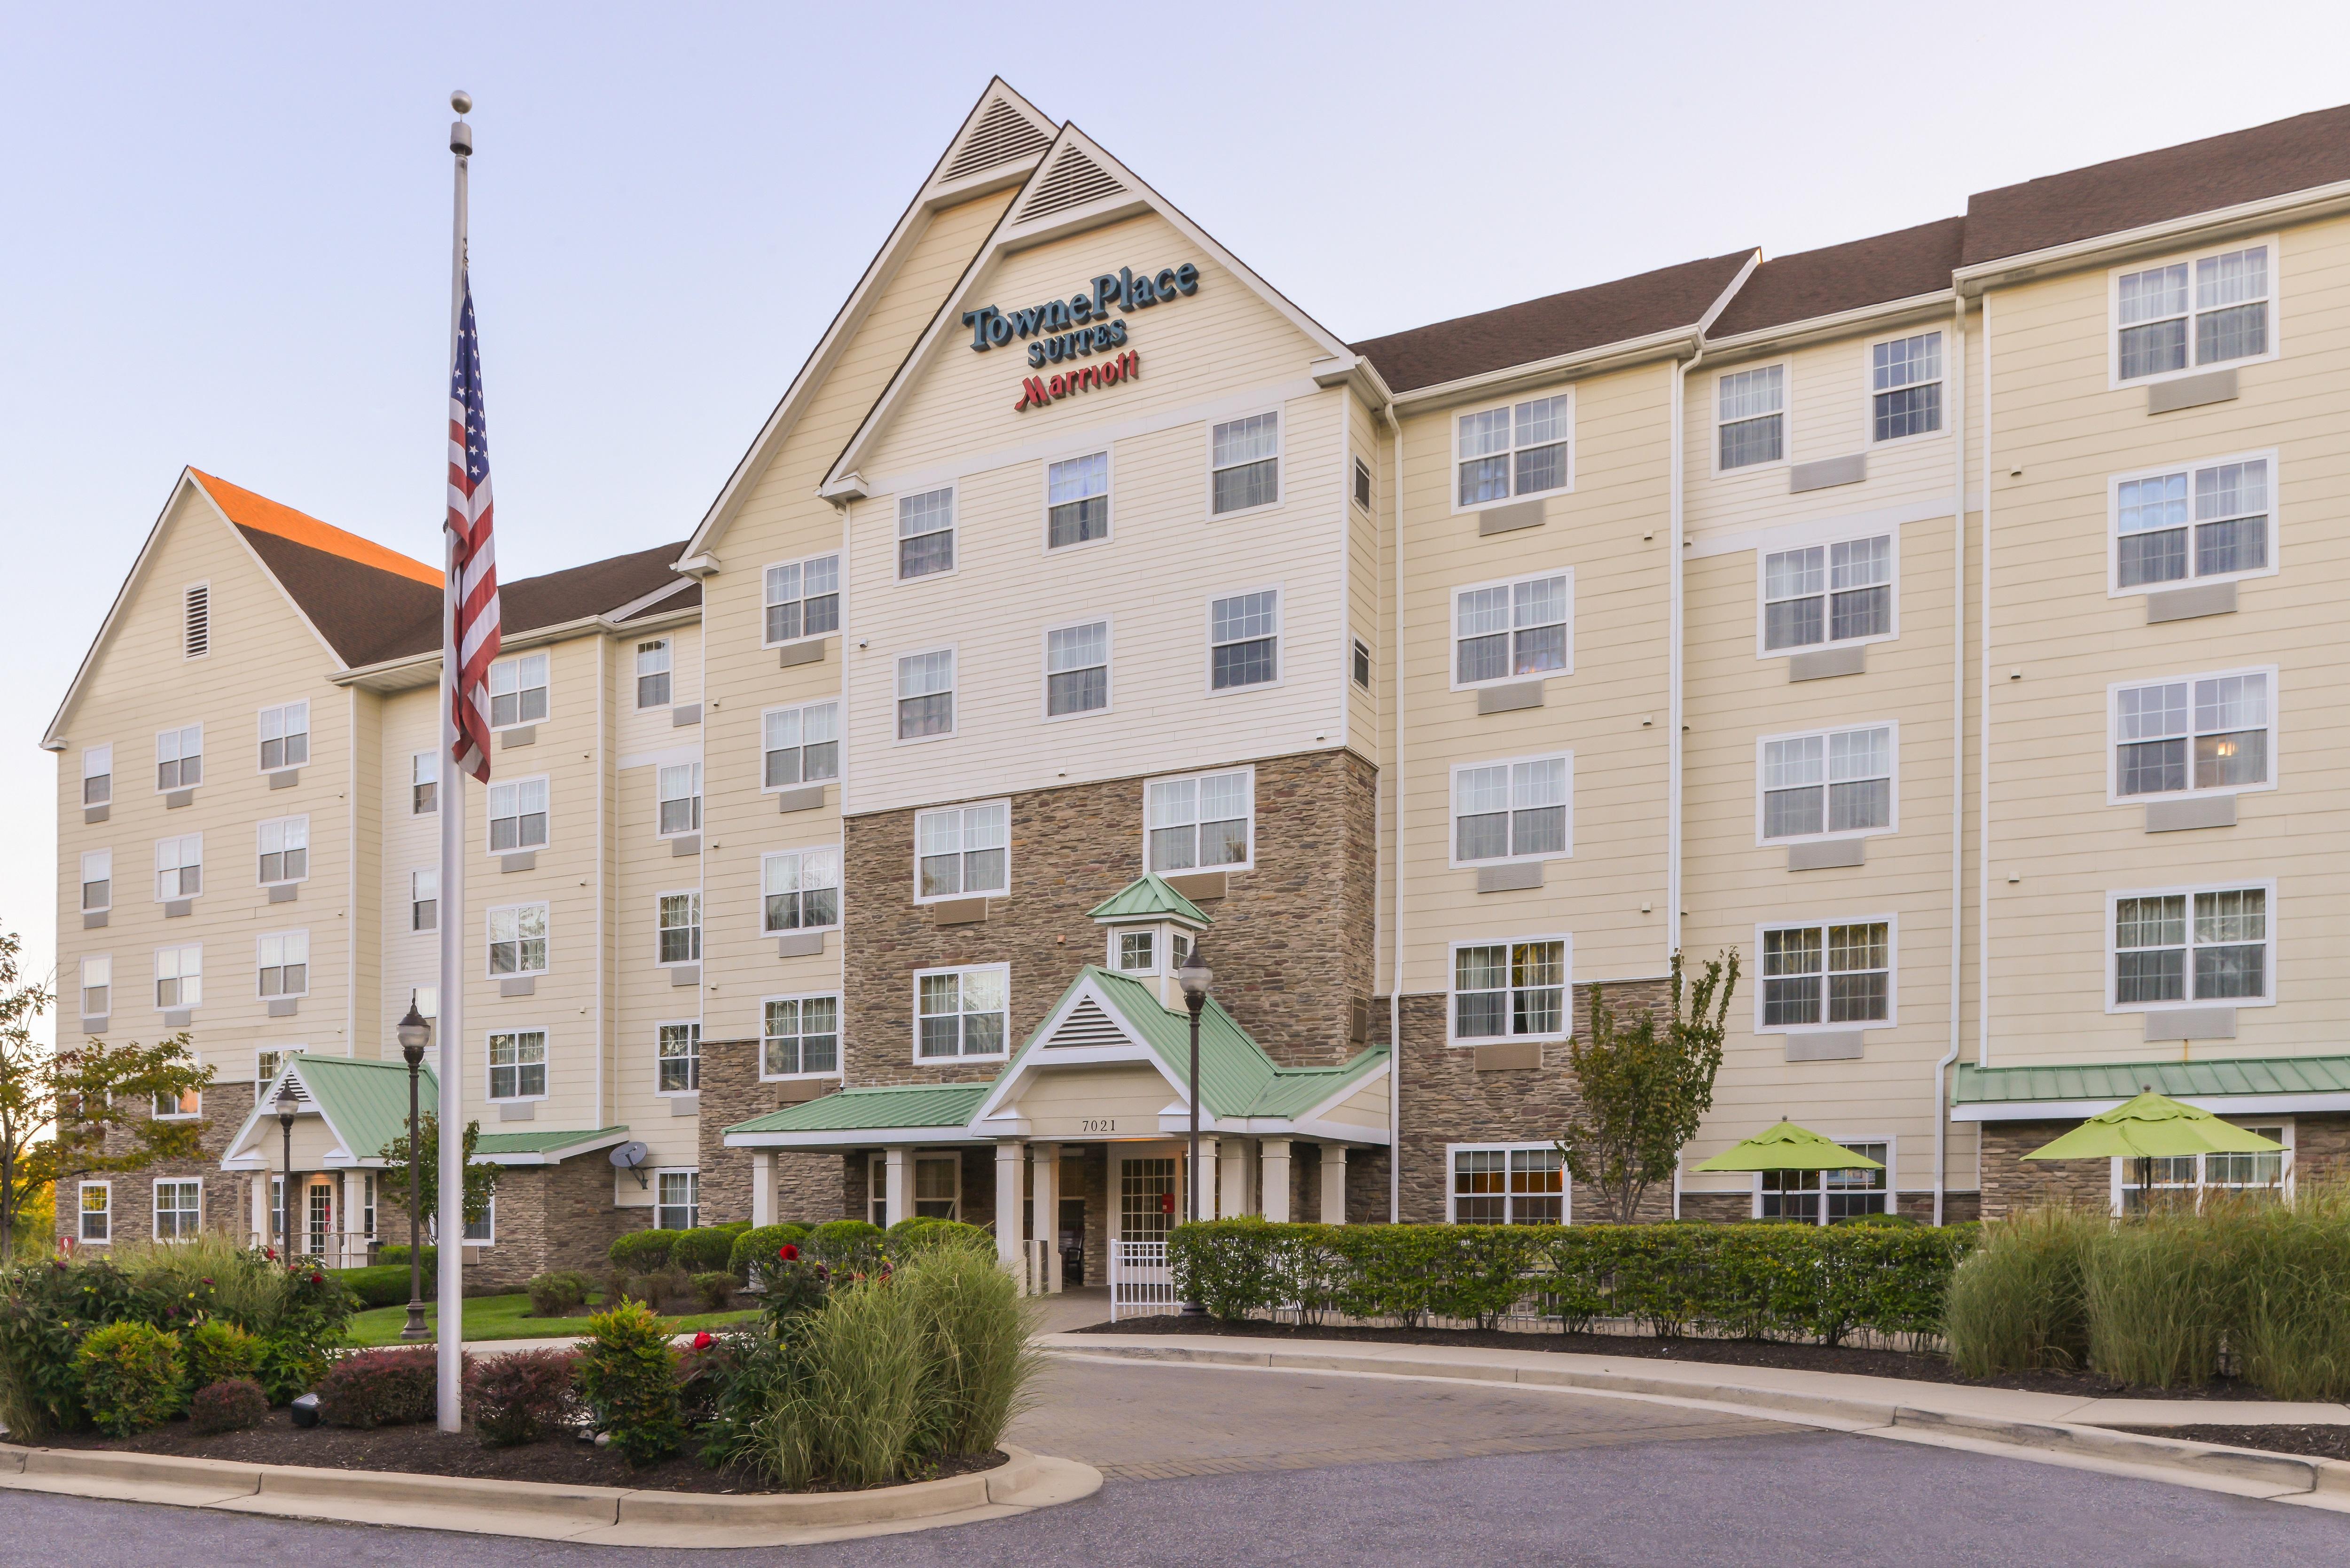 live casino & hotel arundel mills circle hanover md